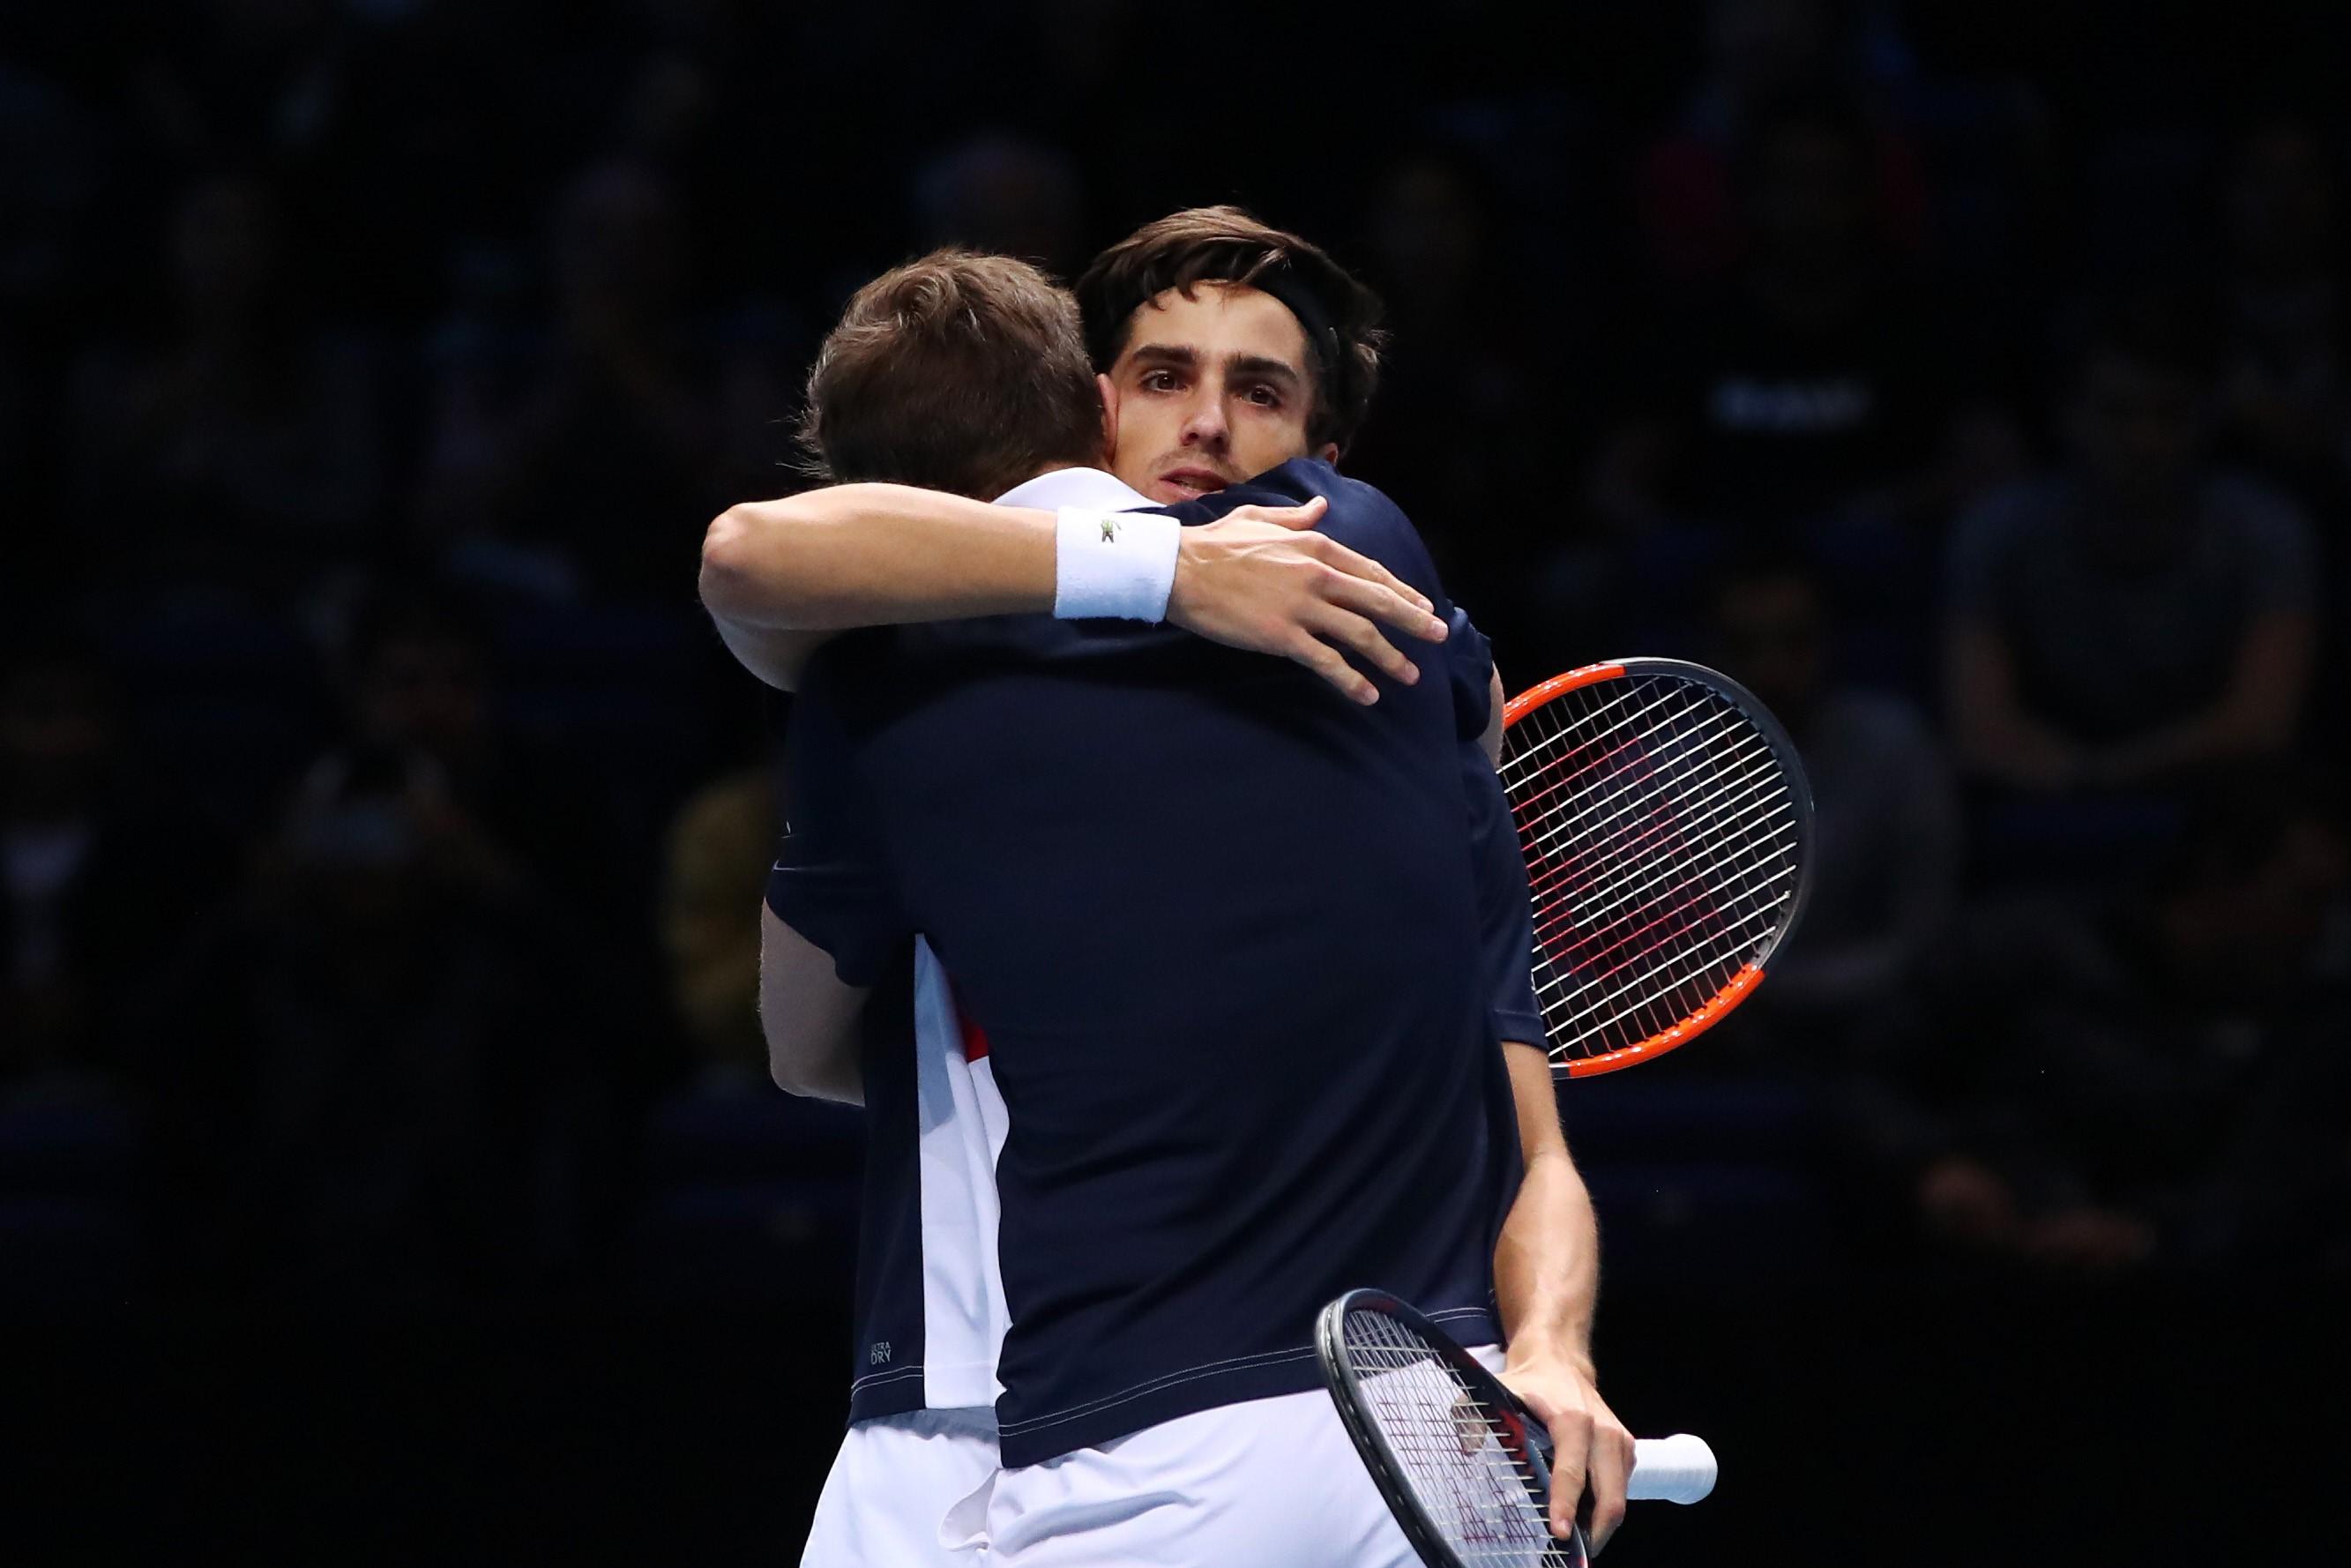 Nicolas Mahut et Pierre-Hugues Herbert lors de la 1/2 finale du Masters